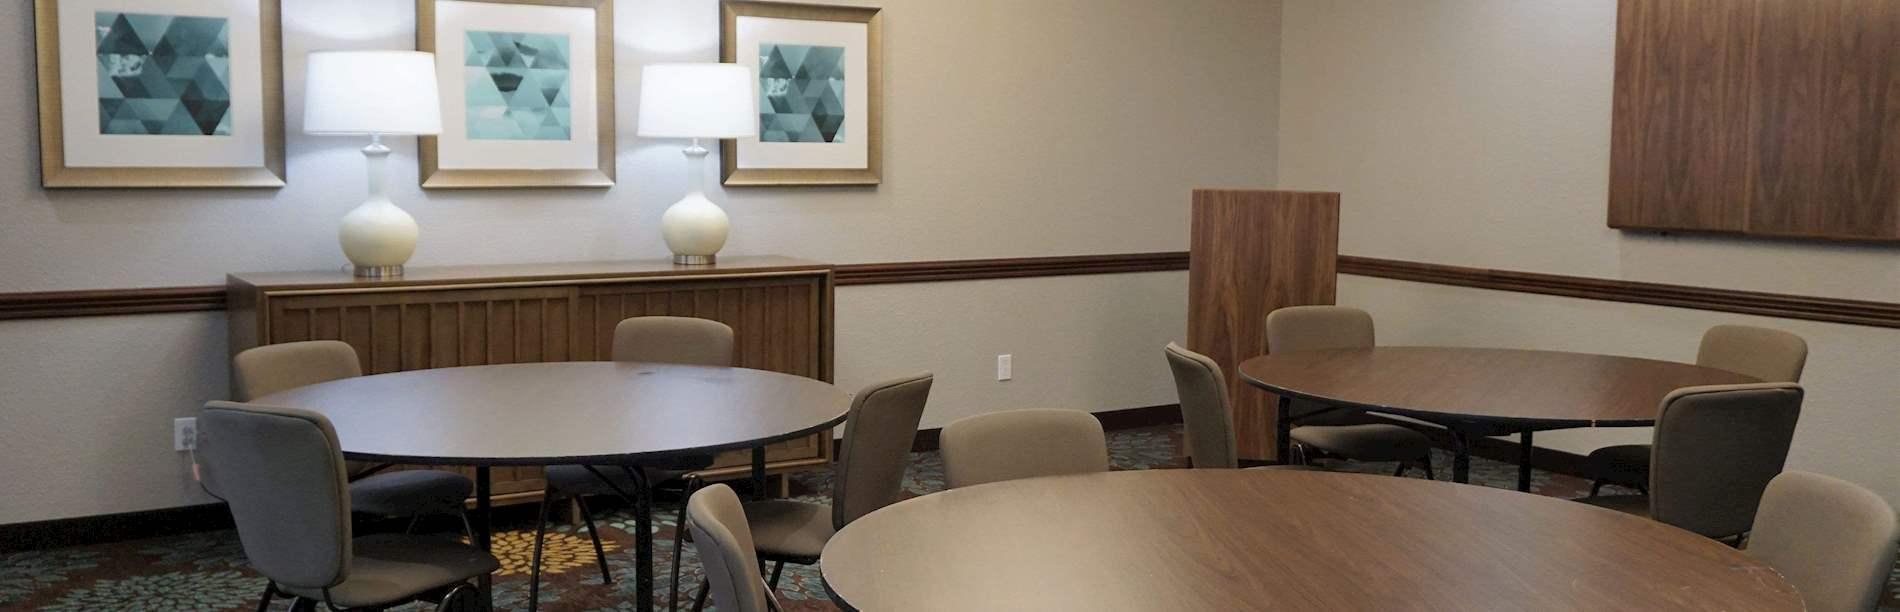 Meetings at Columbia Hotel, Missouri